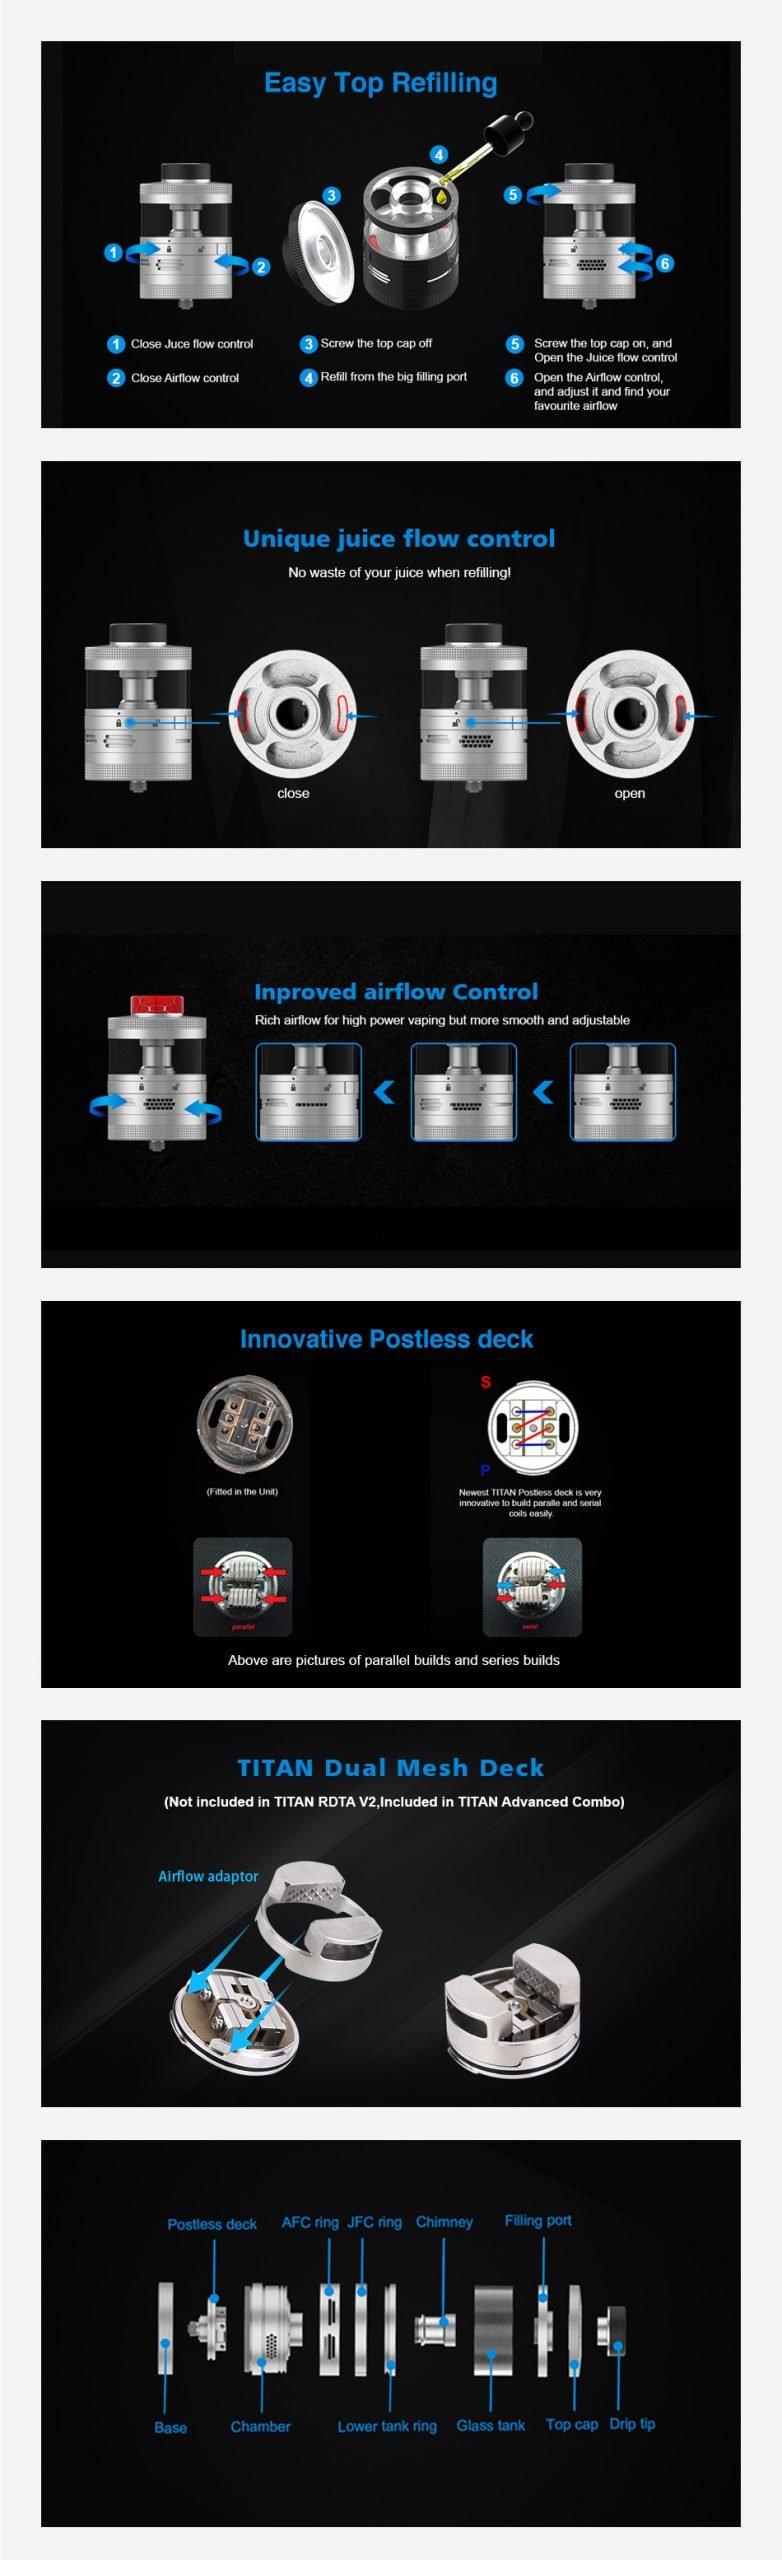 Steam-Crave-Aromamizer-TitanV2-RDTA-Features-UK